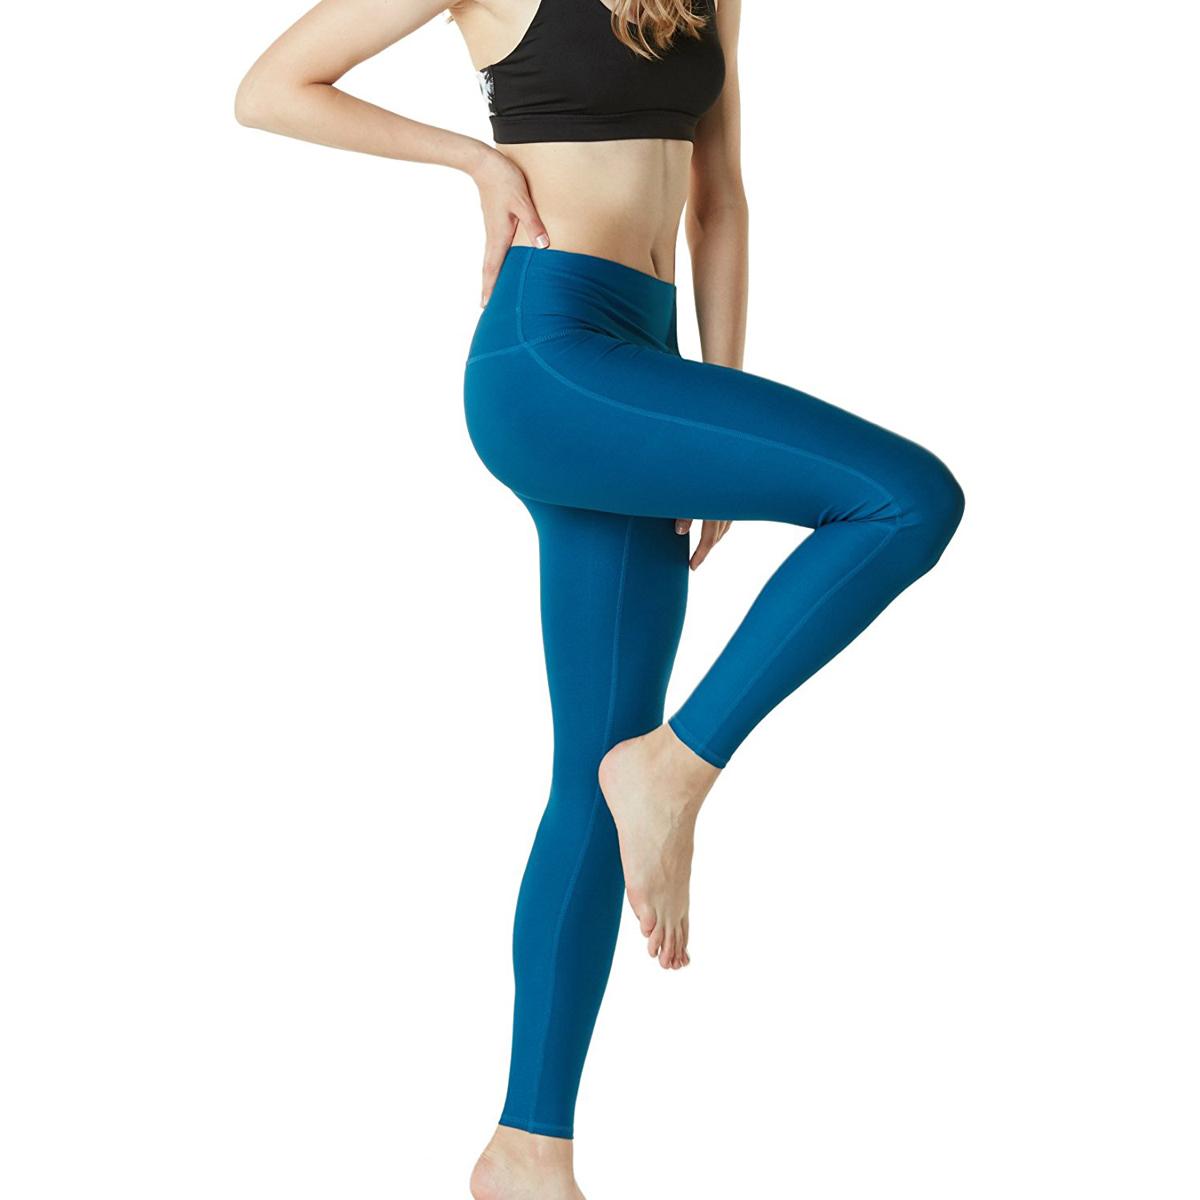 thumbnail 35 - TSLA Tesla FYP42 Women's High-Waisted Ultra-Stretch Tummy Control Yoga Pants